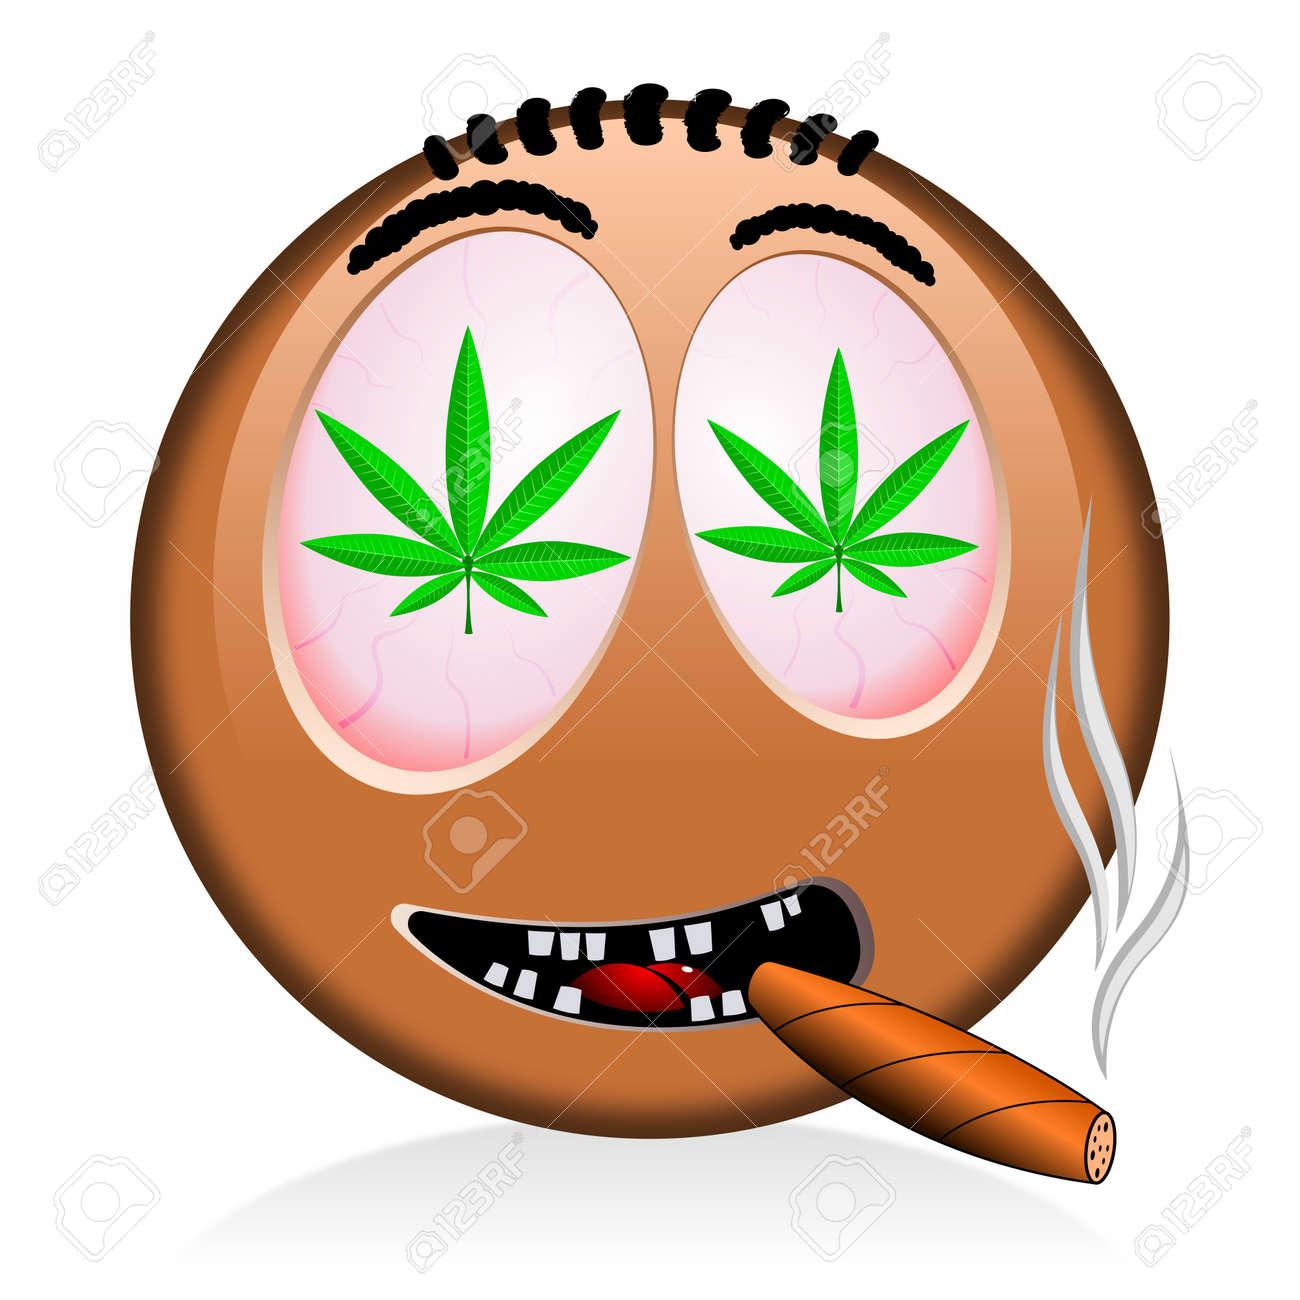 Smoking Weed Emoji Wiring Diagrams Ad8225 High Resolution Analog Digital Converter Adc Circuit Diagram And Datasheet Stock Photo Picture Royalty Free Image Rh 123rf Com Smoke Everyday